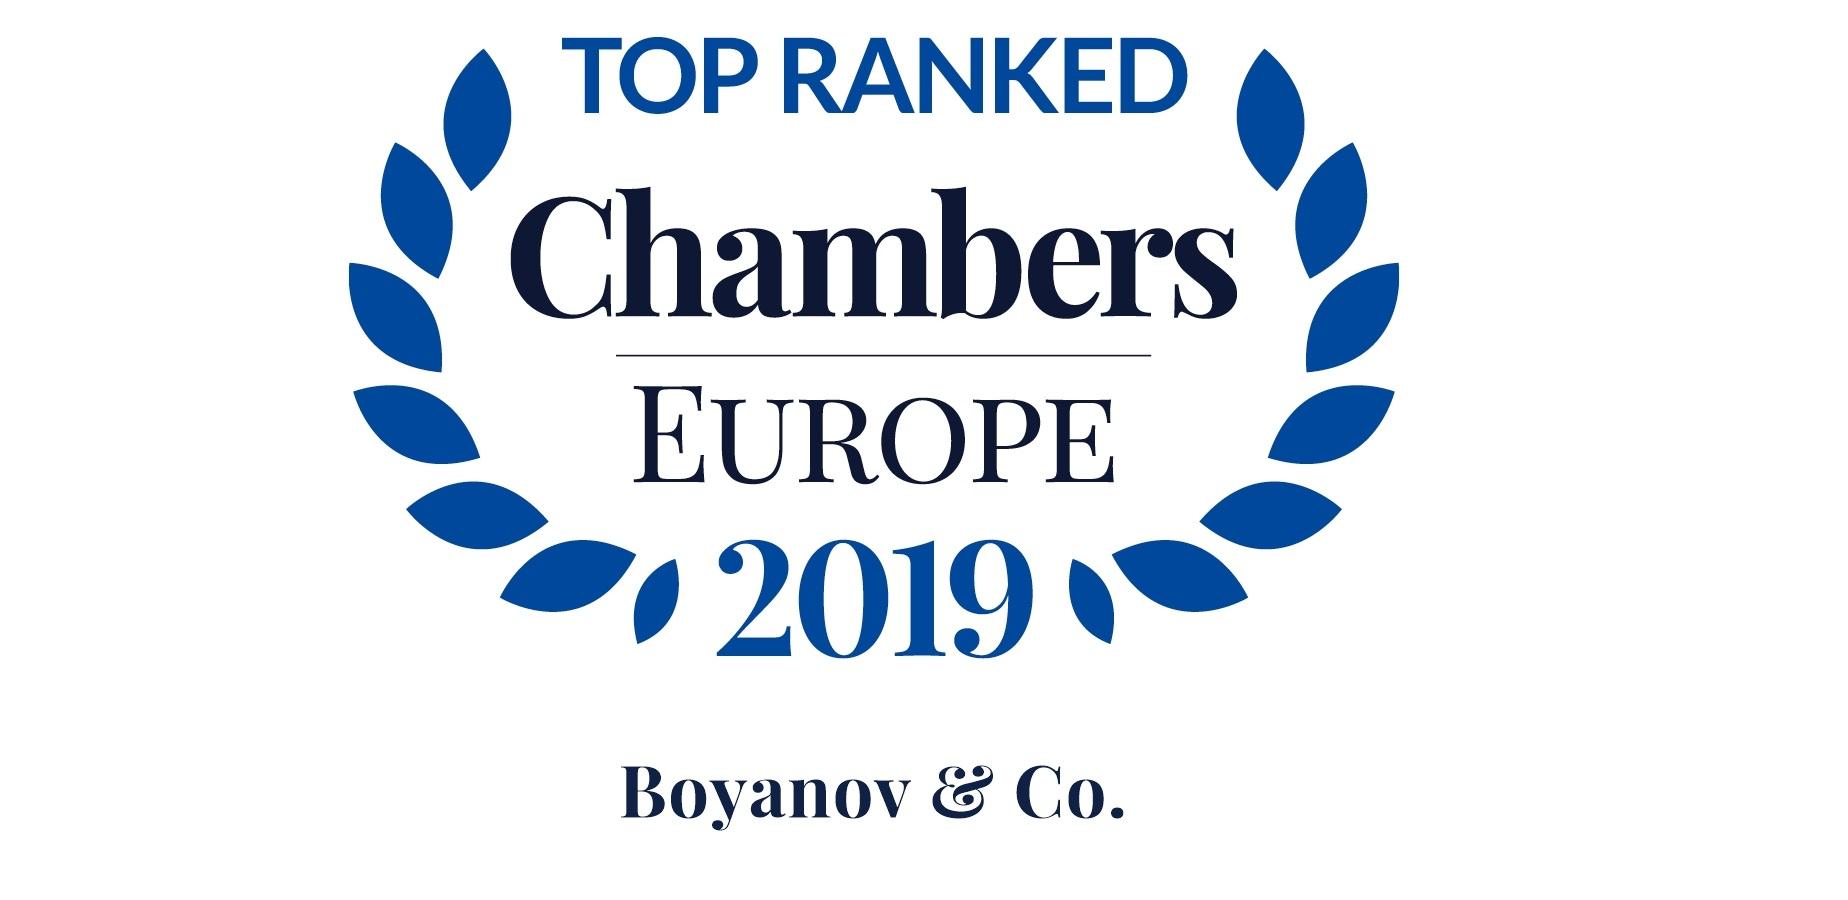 boyanov-co-top-ranked-in-chambers-europe-2019